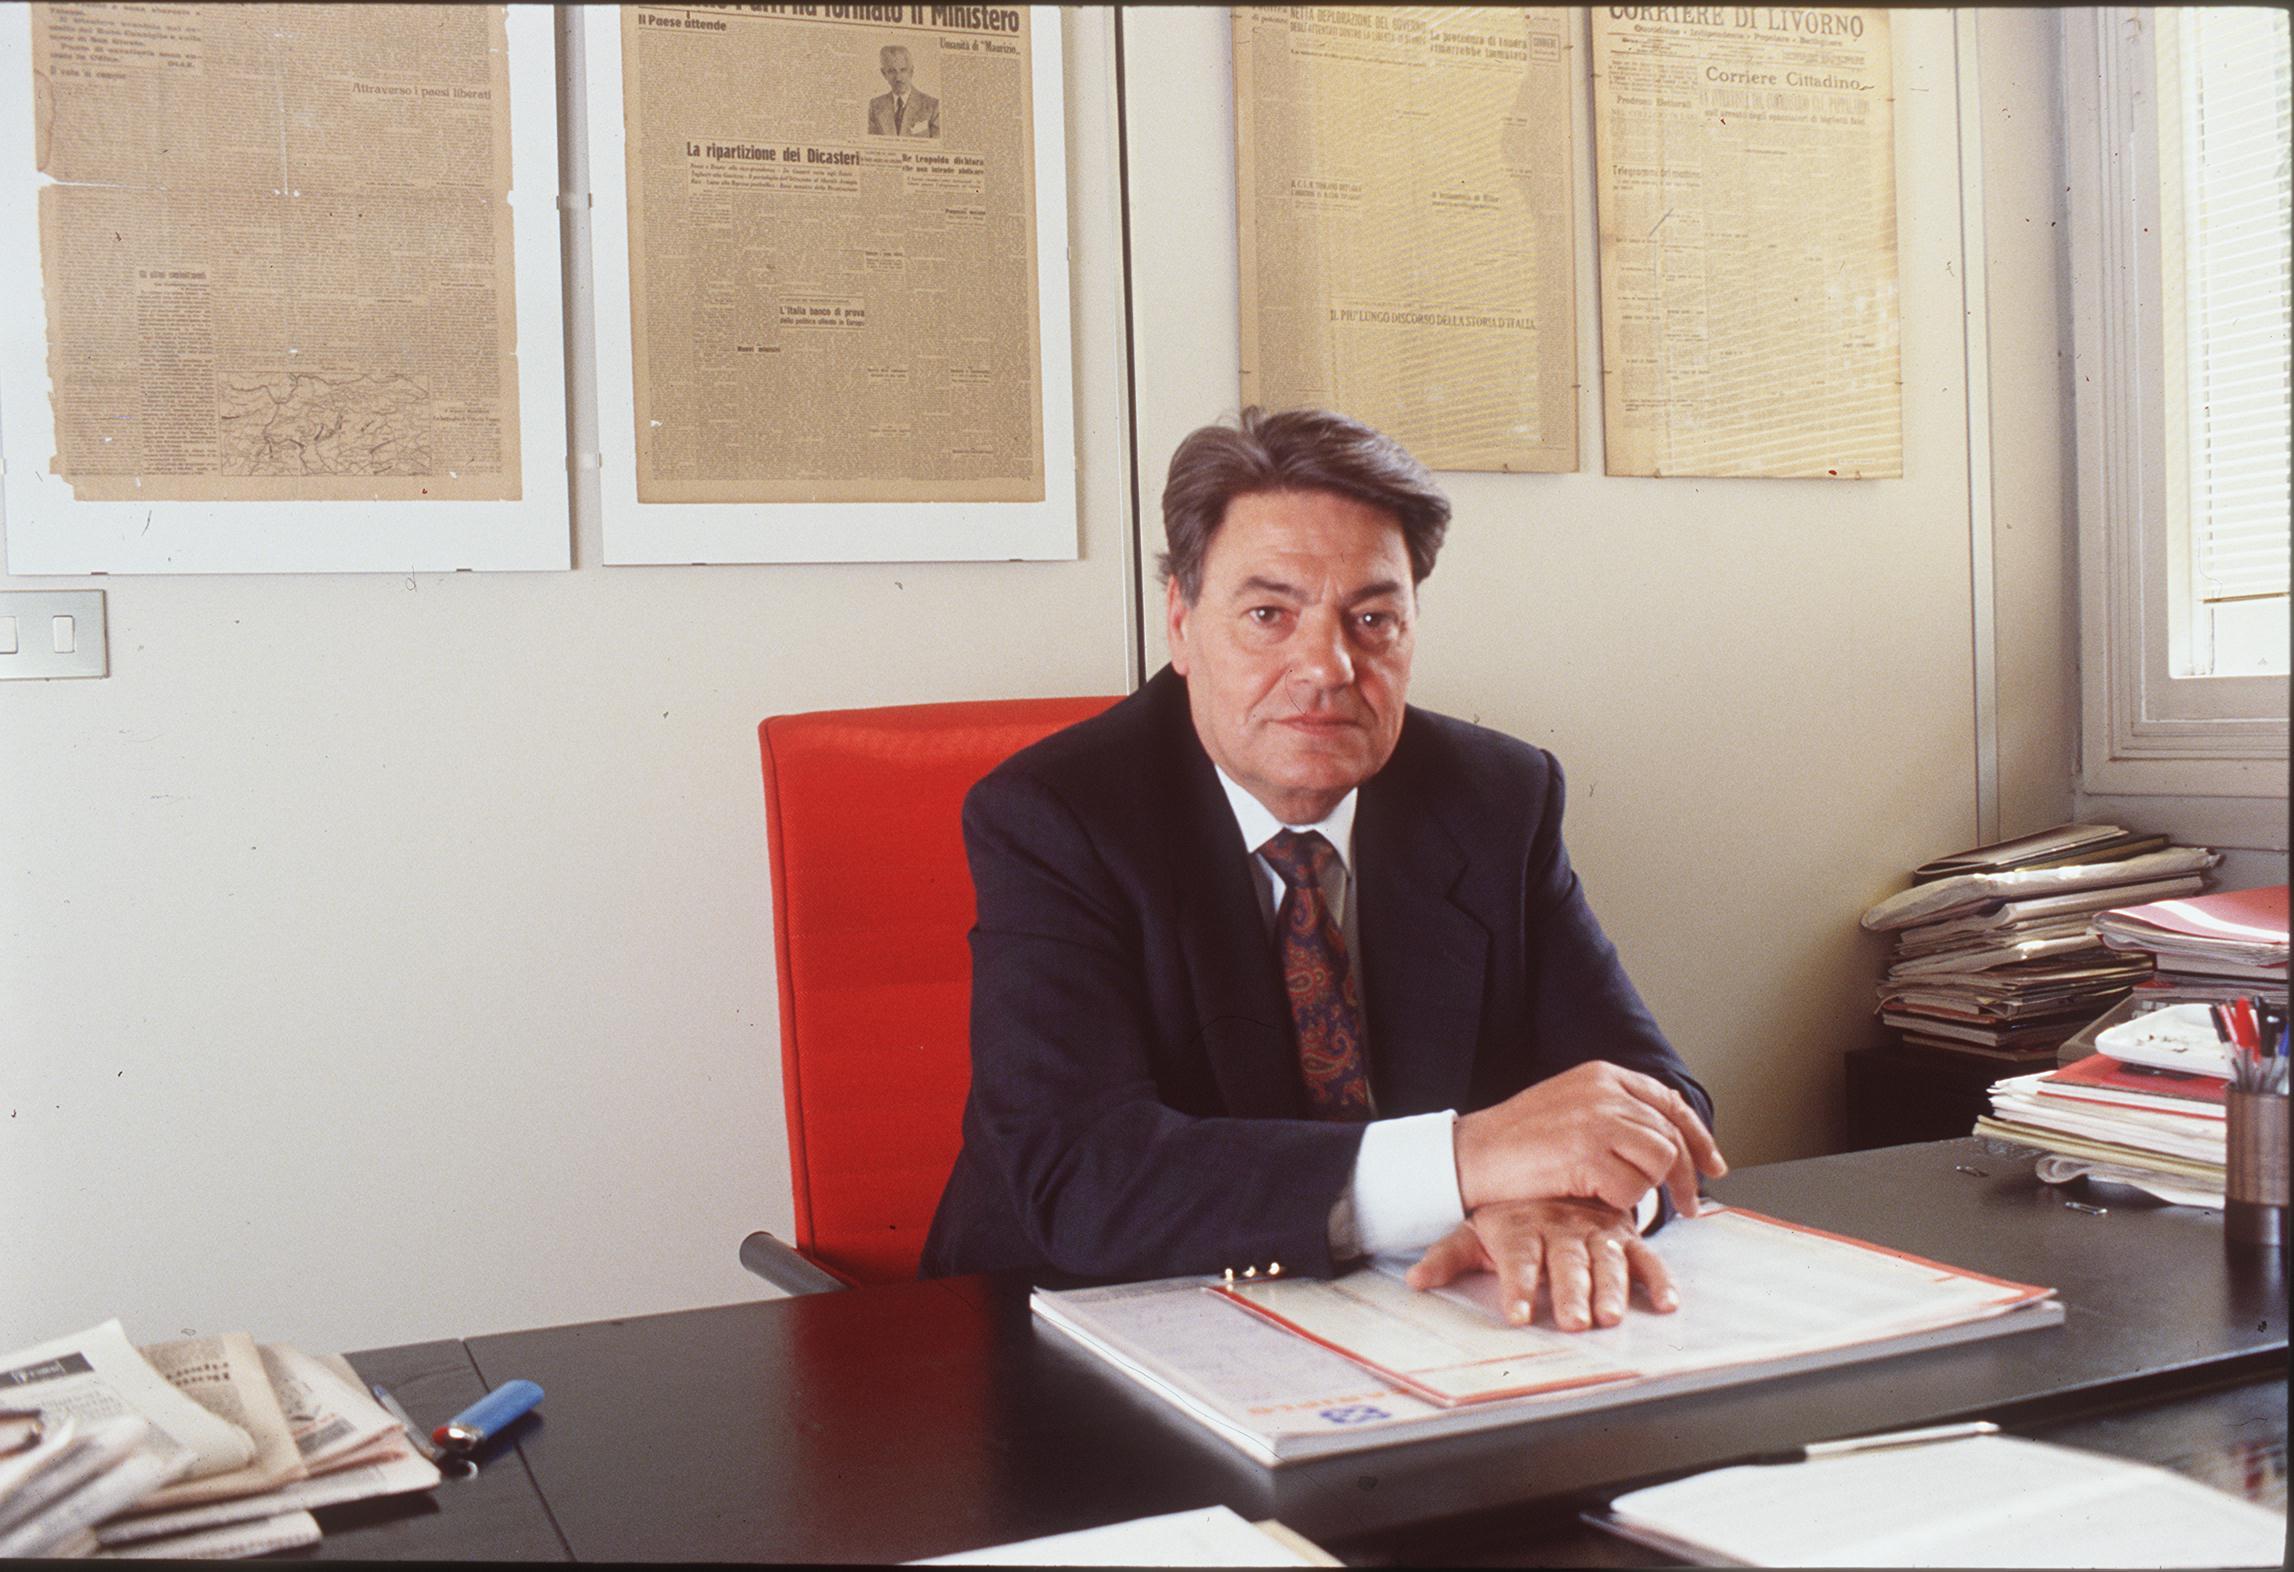 dott. luigi de fabiani giornalista